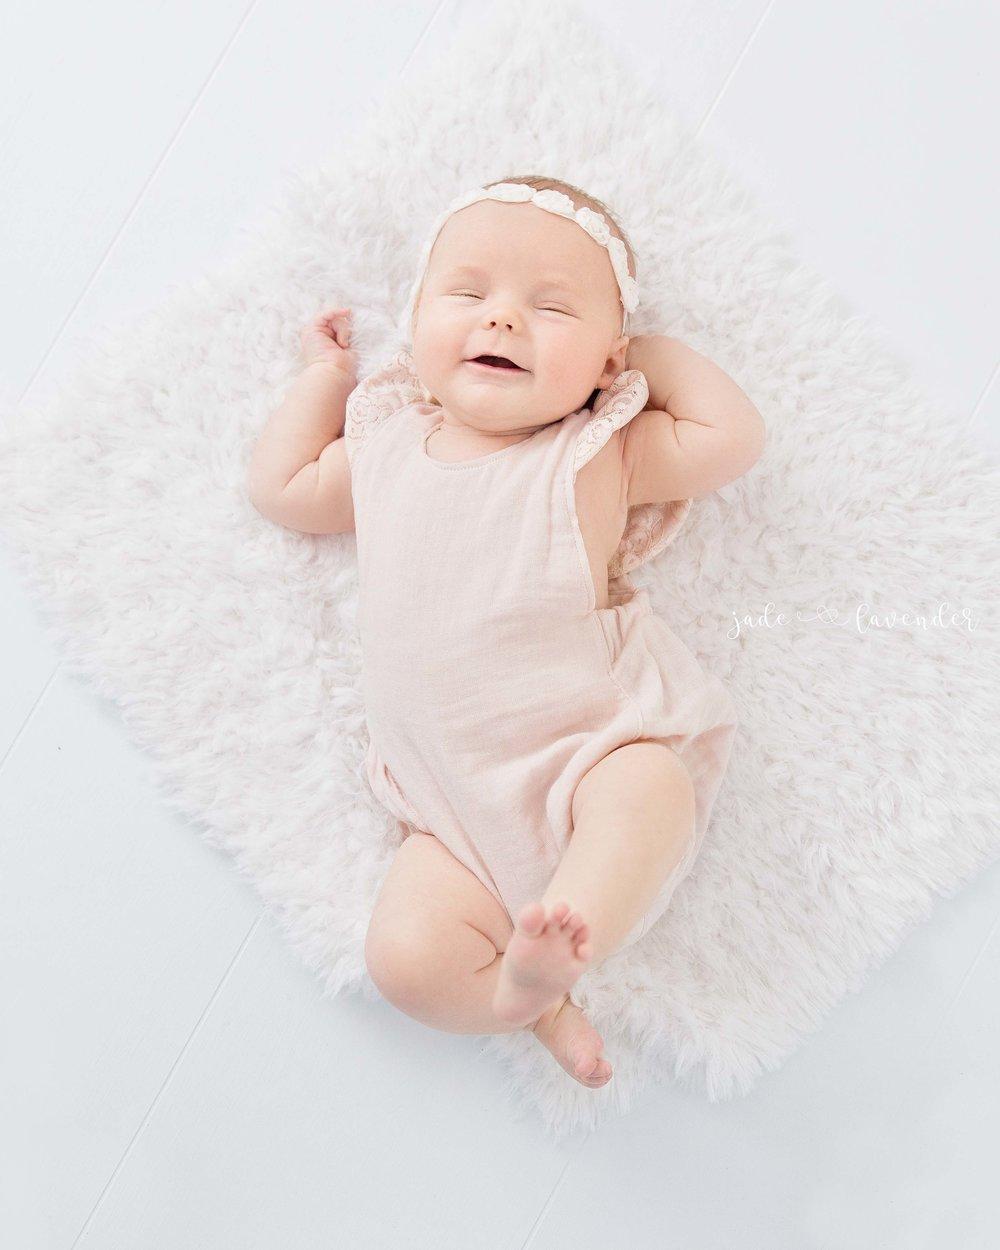 three-month-milestone-photos-baby-girl-images-newborn-photography-spokane-washington.jpg